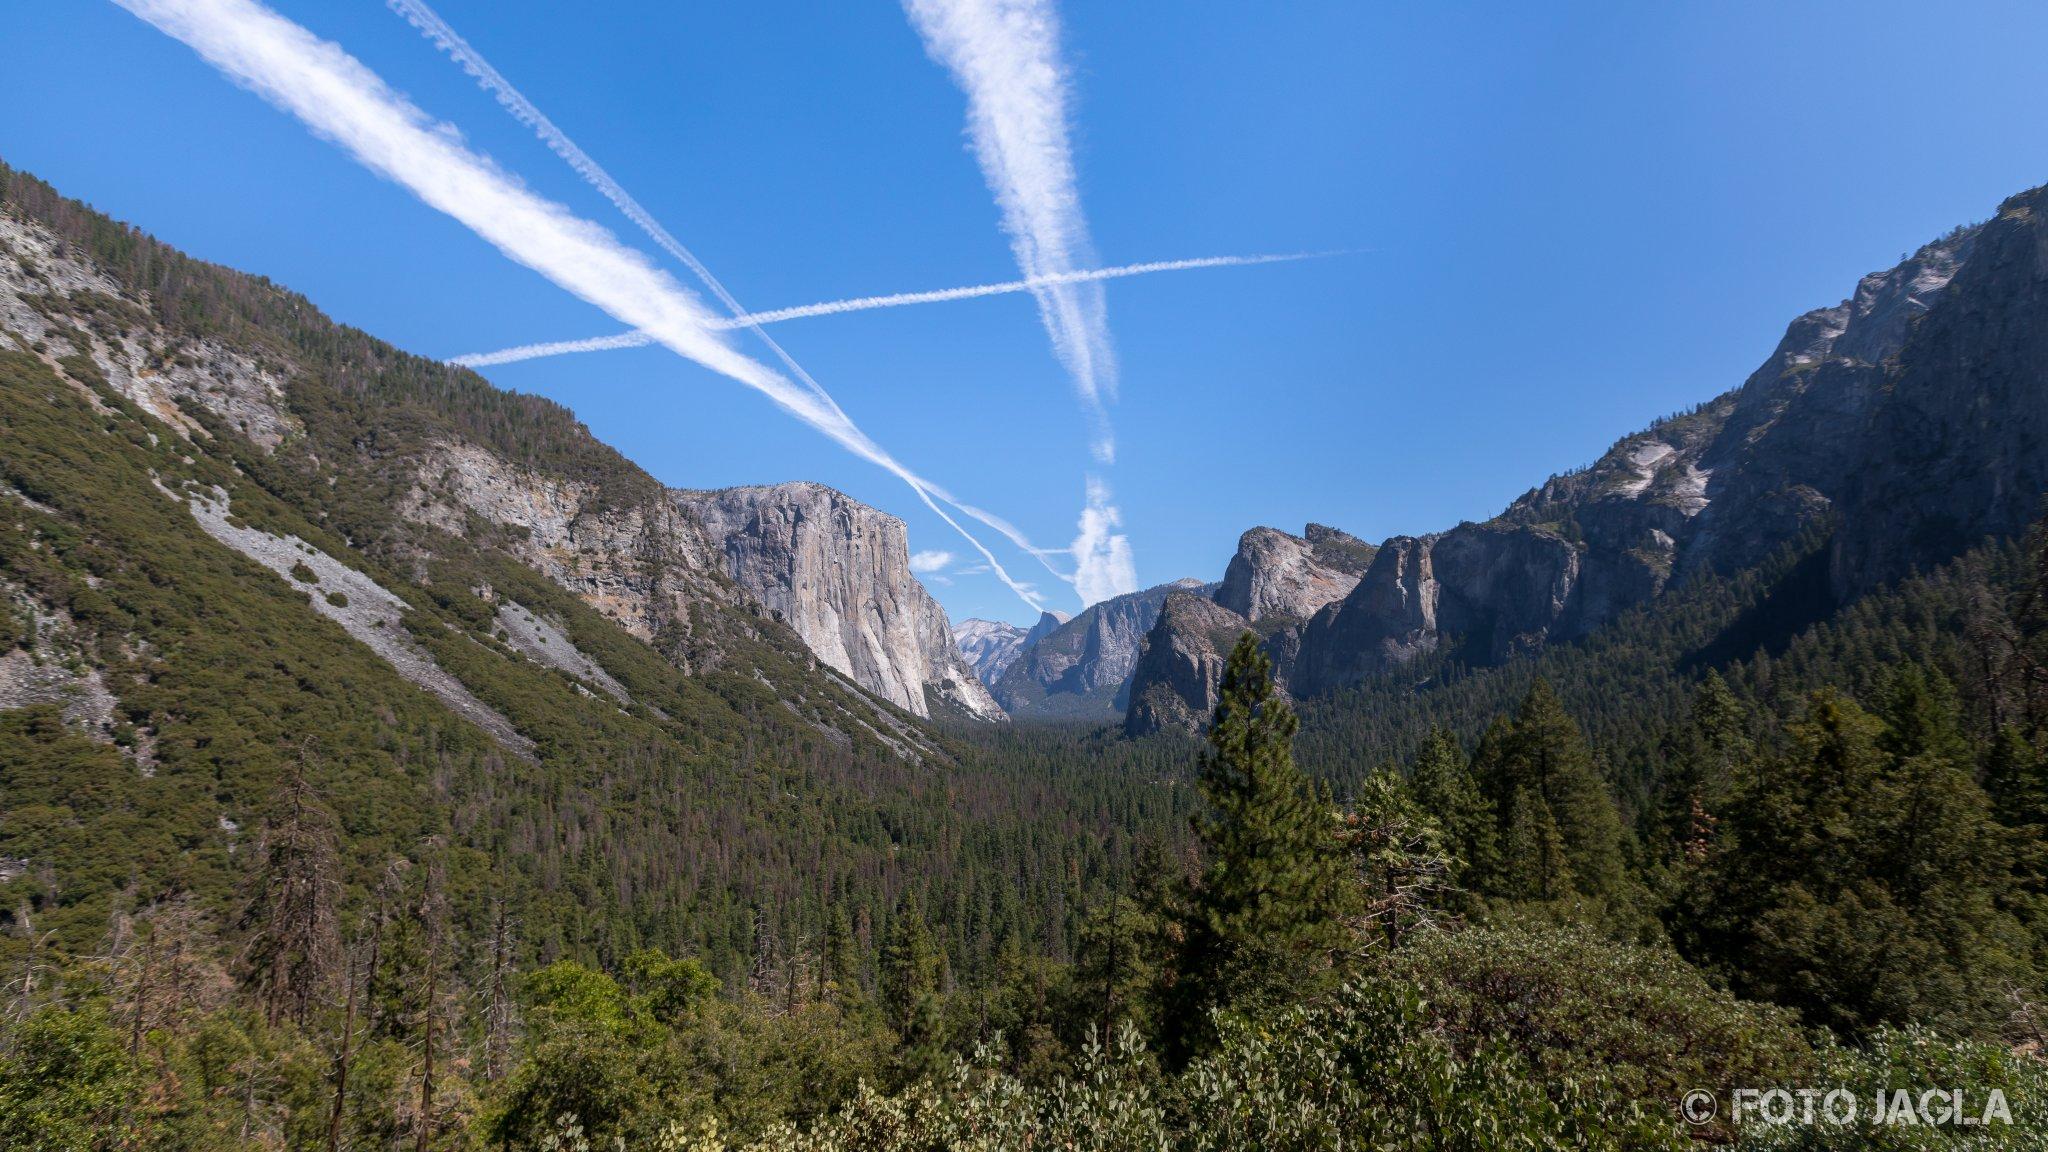 Kalifornien - September 2018 Yosemite Tunnel View - Wawona Road Yosemite National Park - Yosemite Valley, Mariposa Country